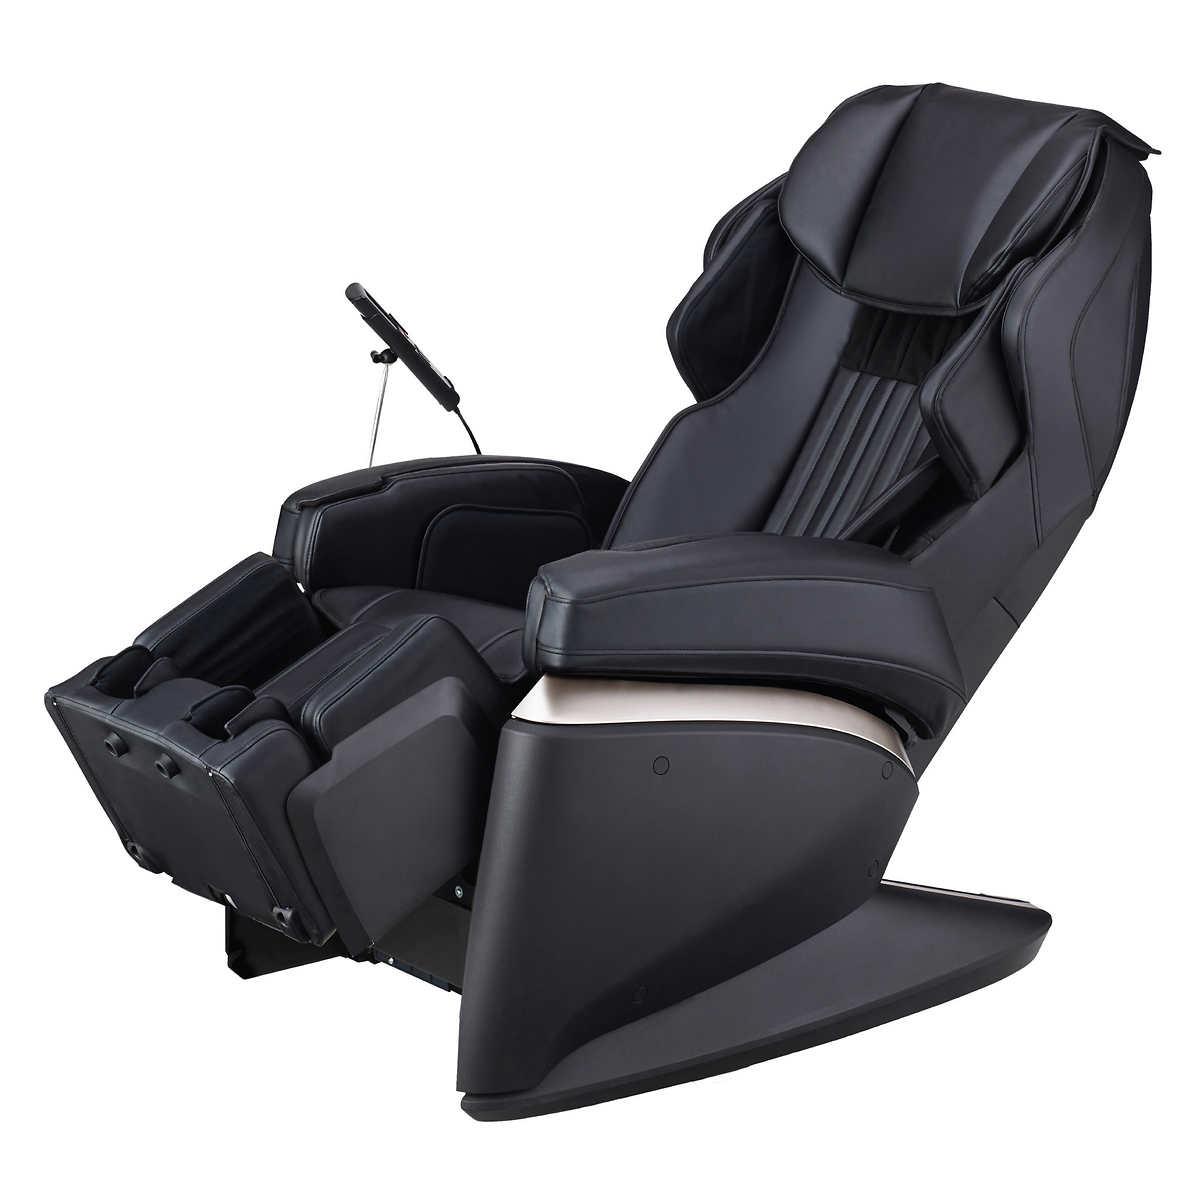 Osim massage chair price - Osaki Made In Japan 4s Massage Chair